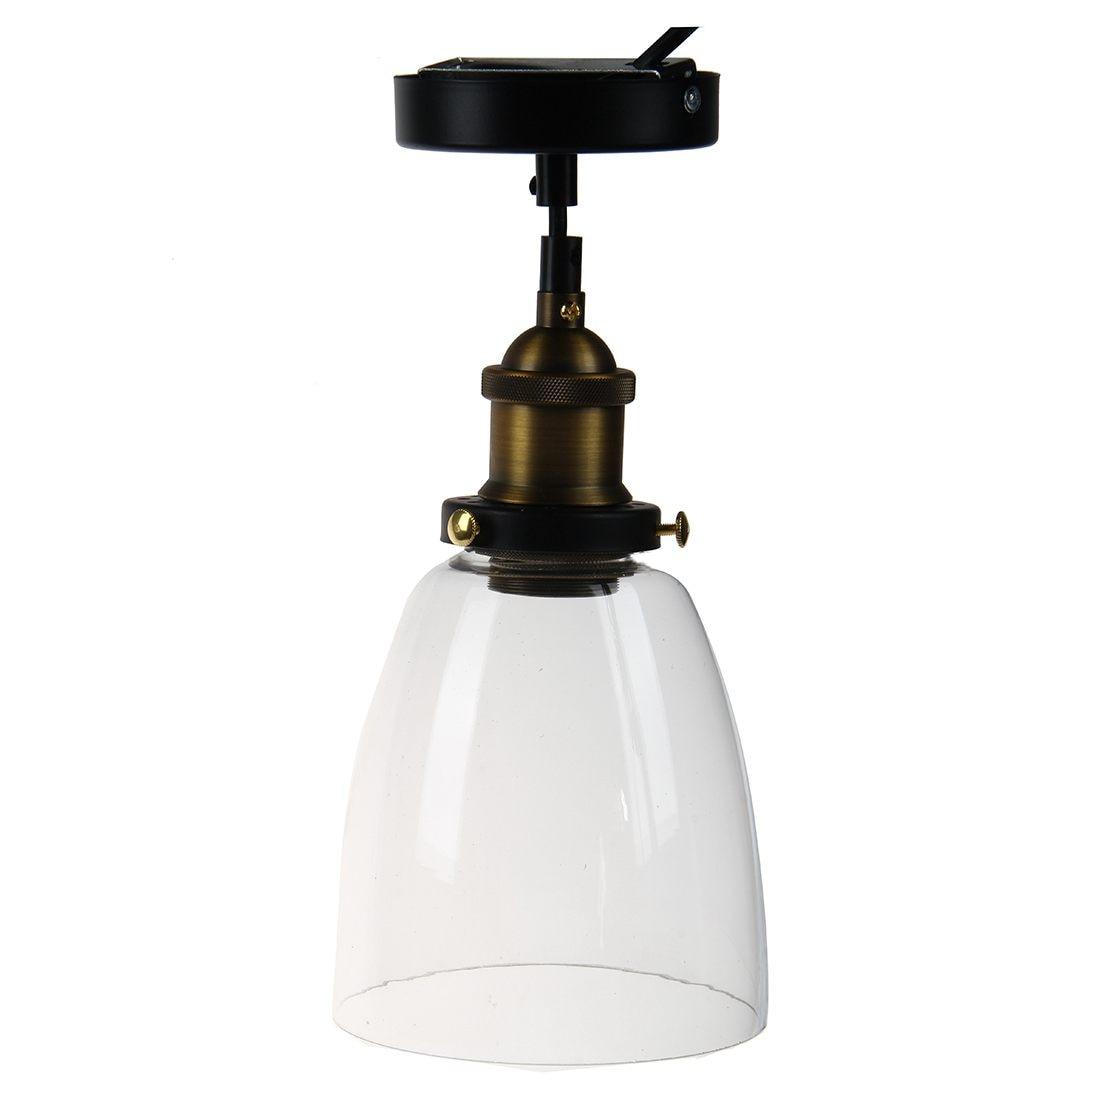 Modern Vintage Industrial Edison Glass Shade Loft Coffee Bar Kitchen Hanging Pendant Lamp Light (Antique head diameter 14.5cm)